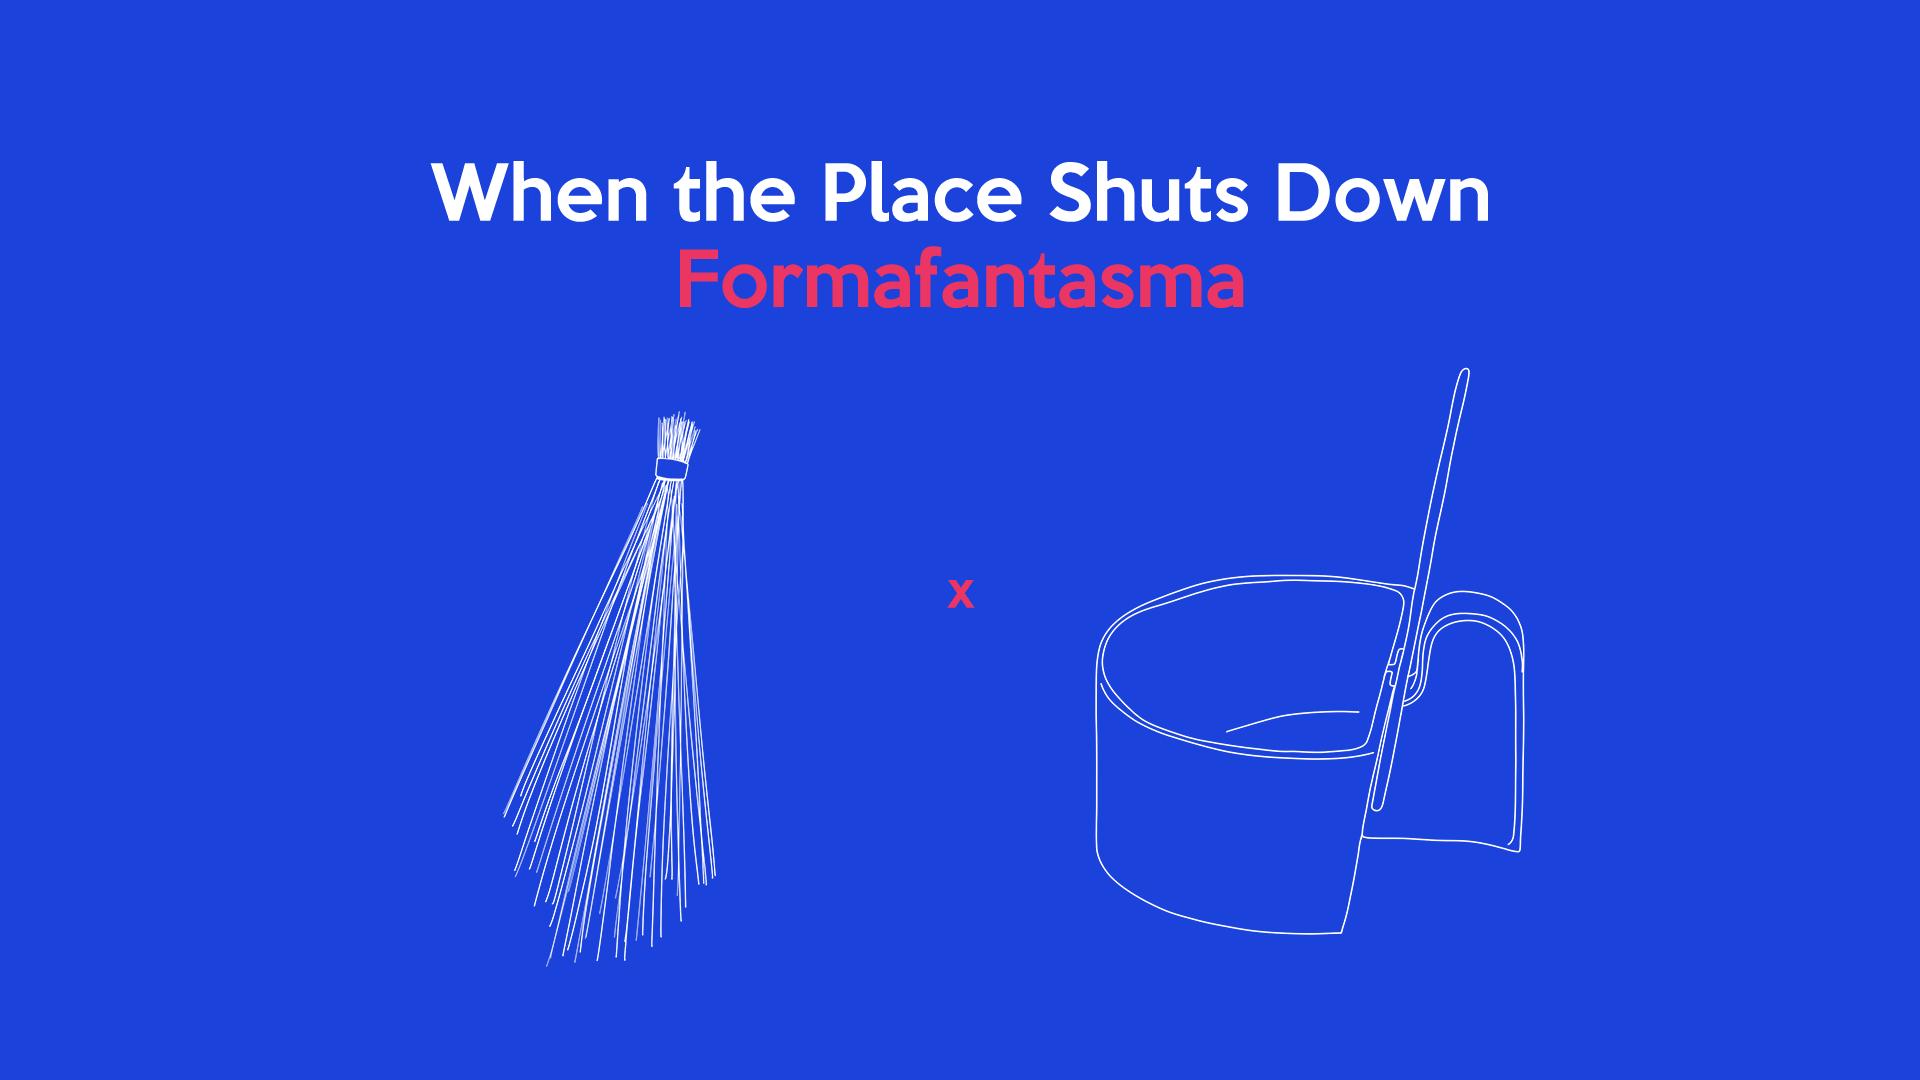 When the Place Shuts Down: Formafantasma